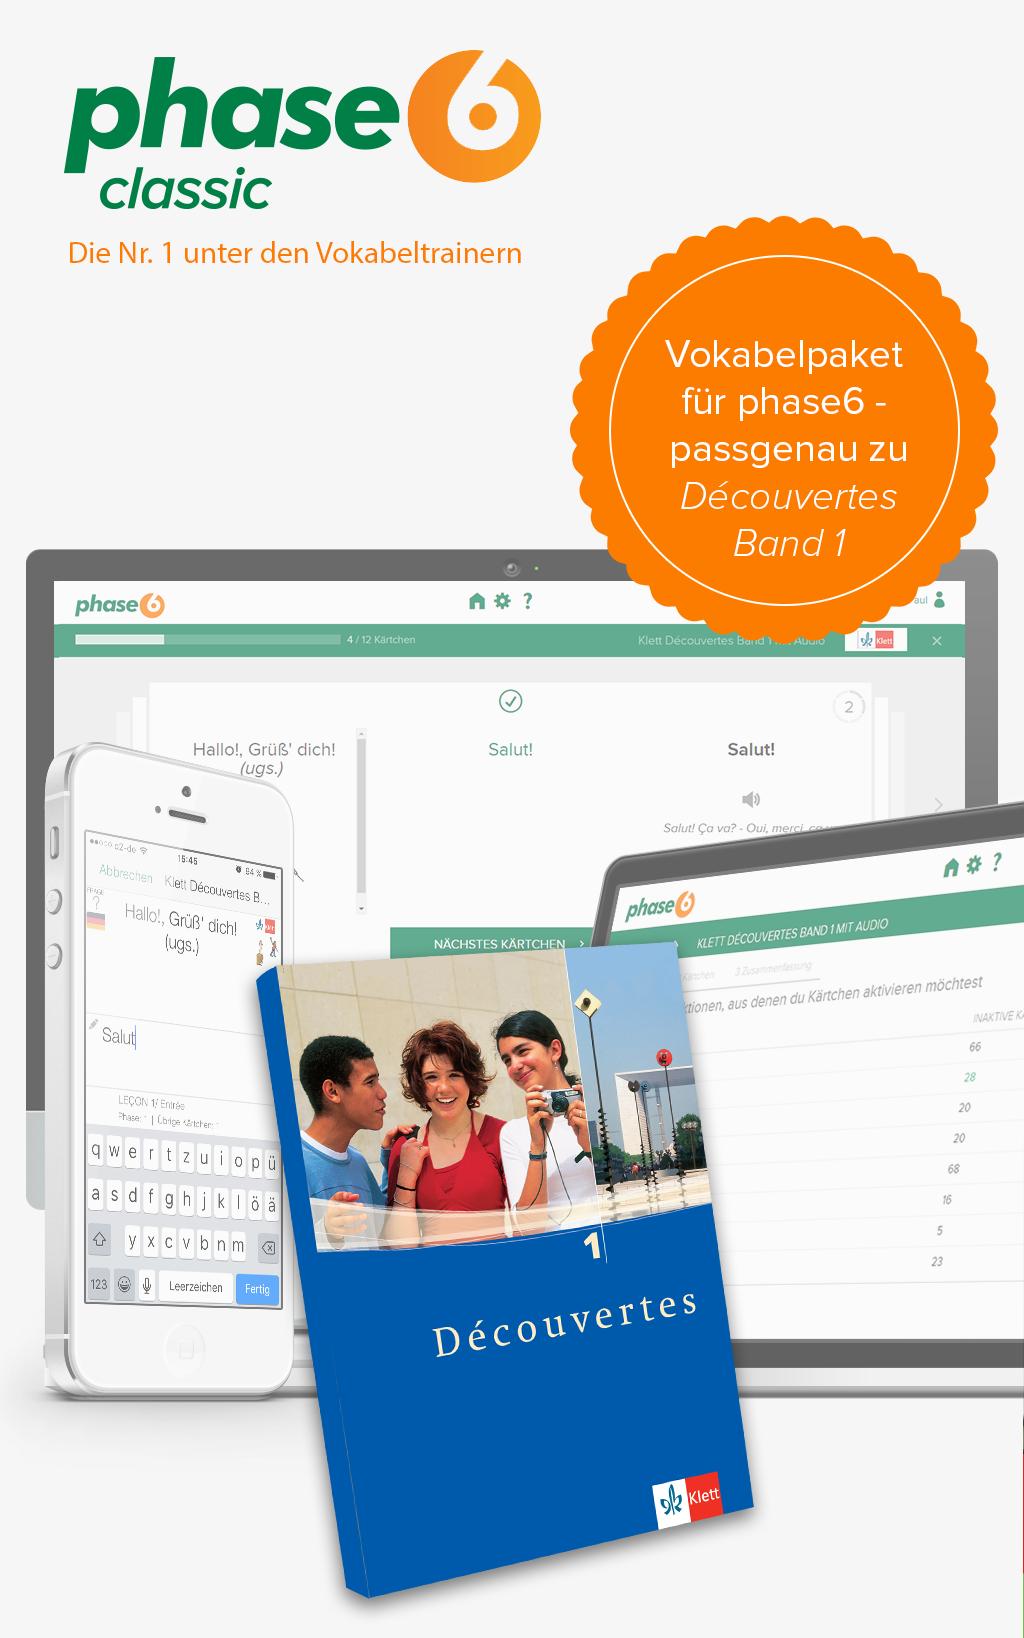 phase-6 Vokabelpaket zu Découvertes - Band 1 [Online Code]